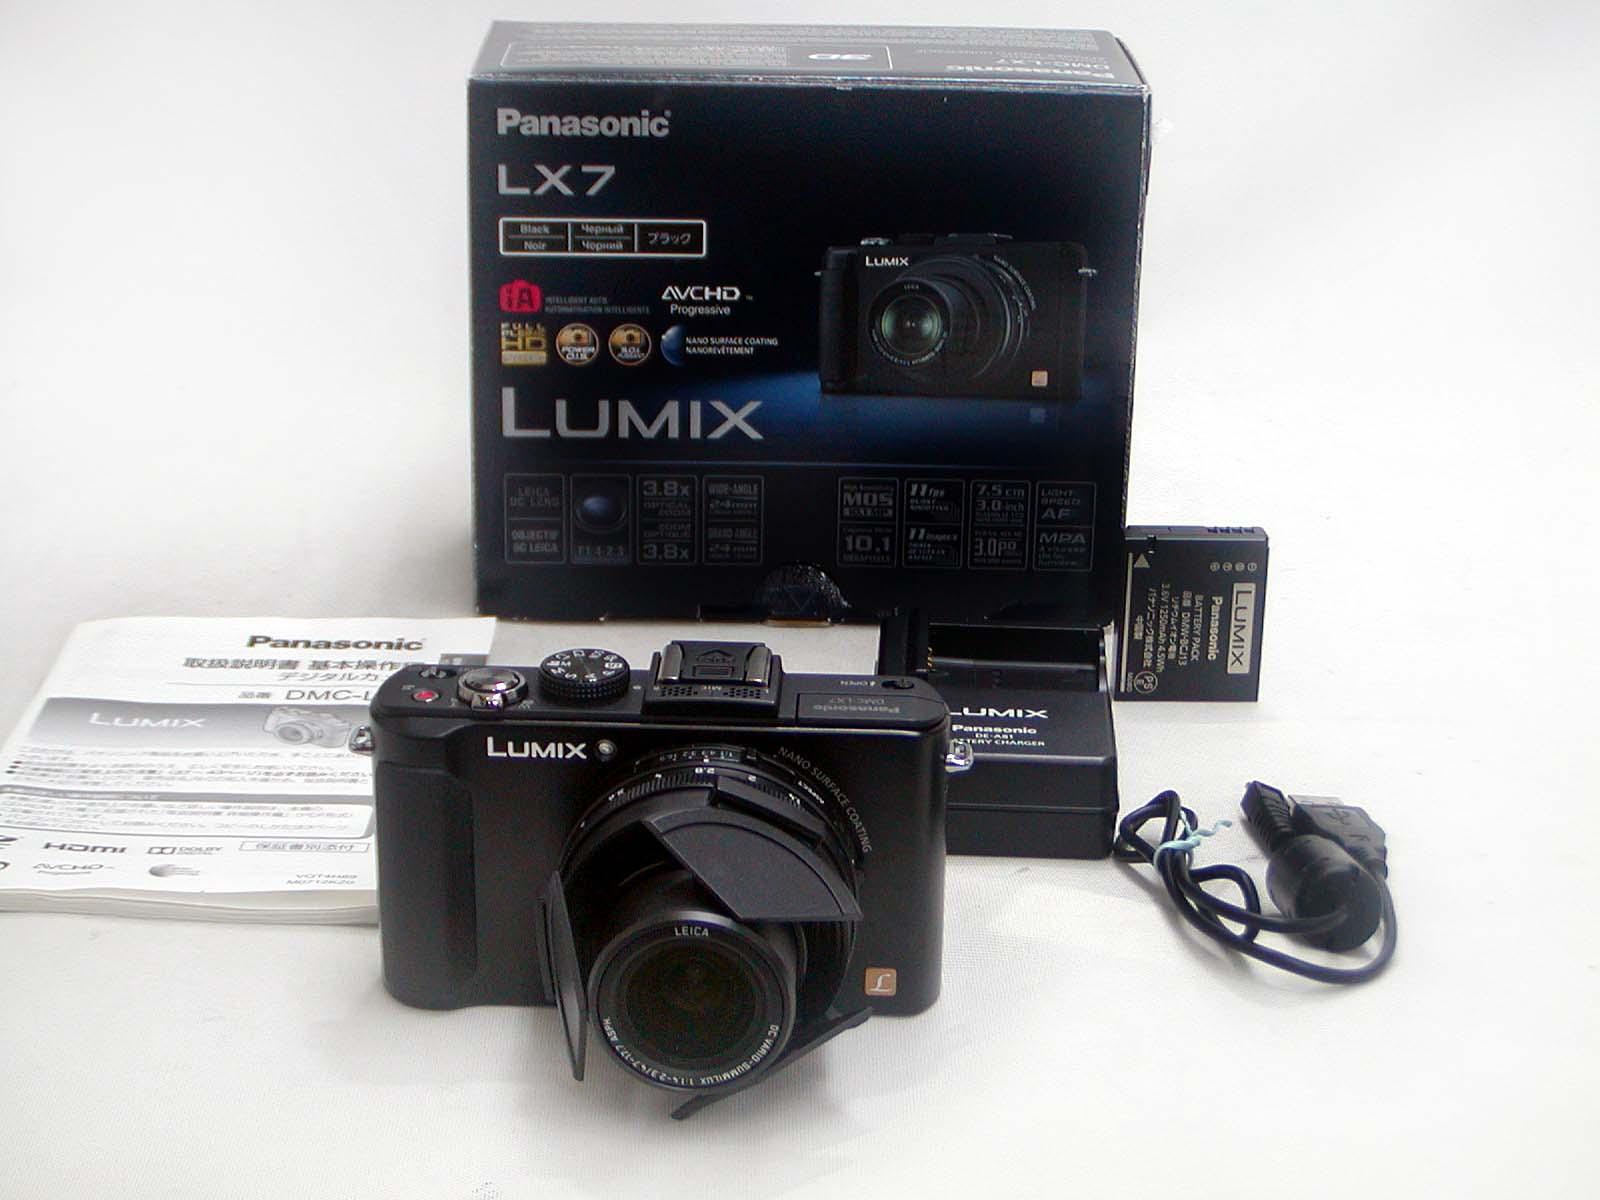 LUMIX DMC-LX7 (Black)